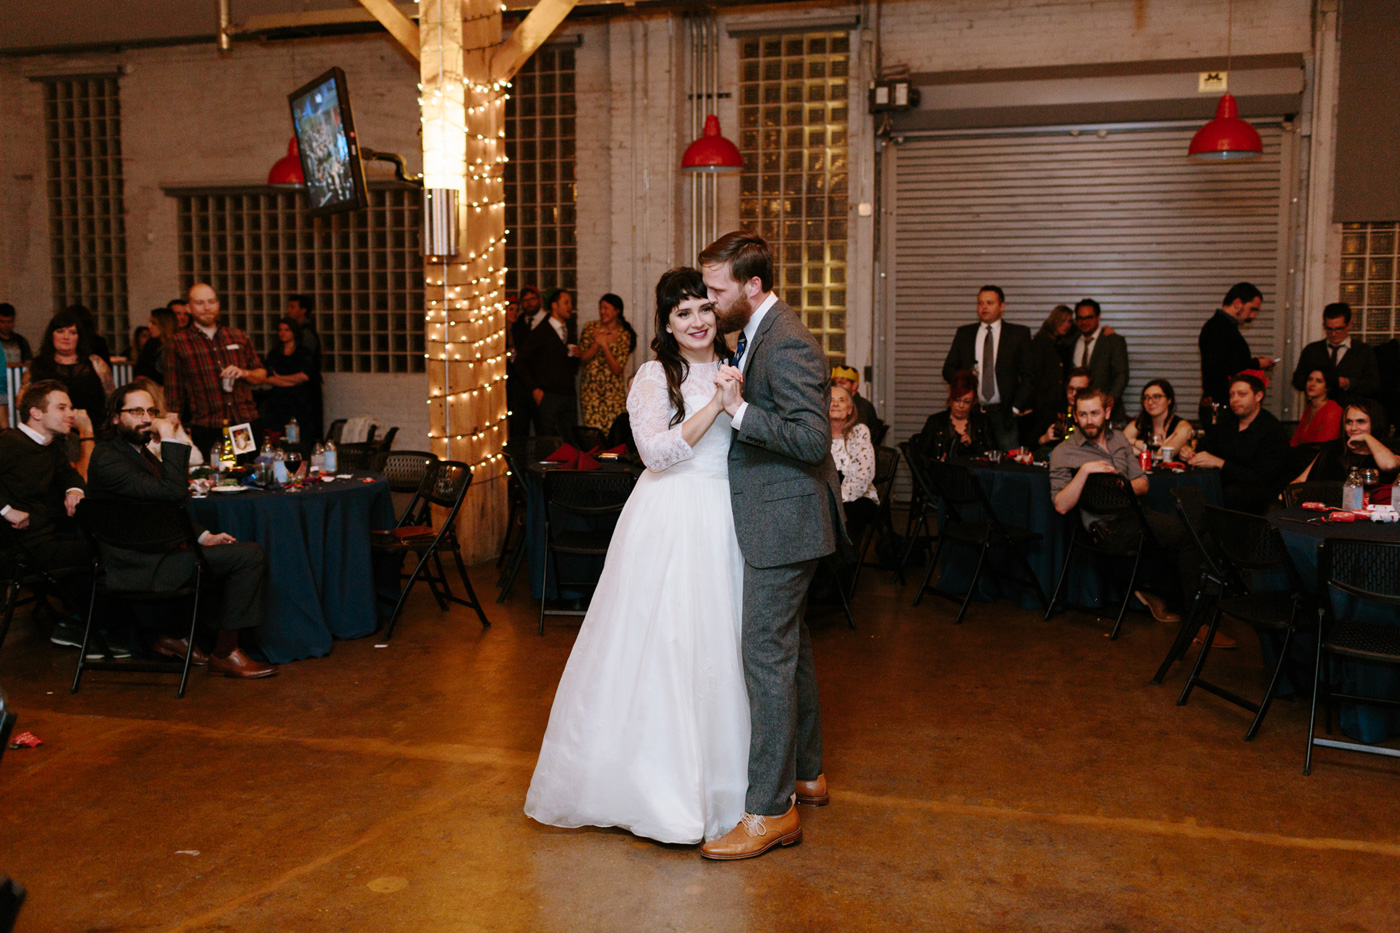 Studios-at-Overland-Crossing-Wedding-Photographer-00054.jpg